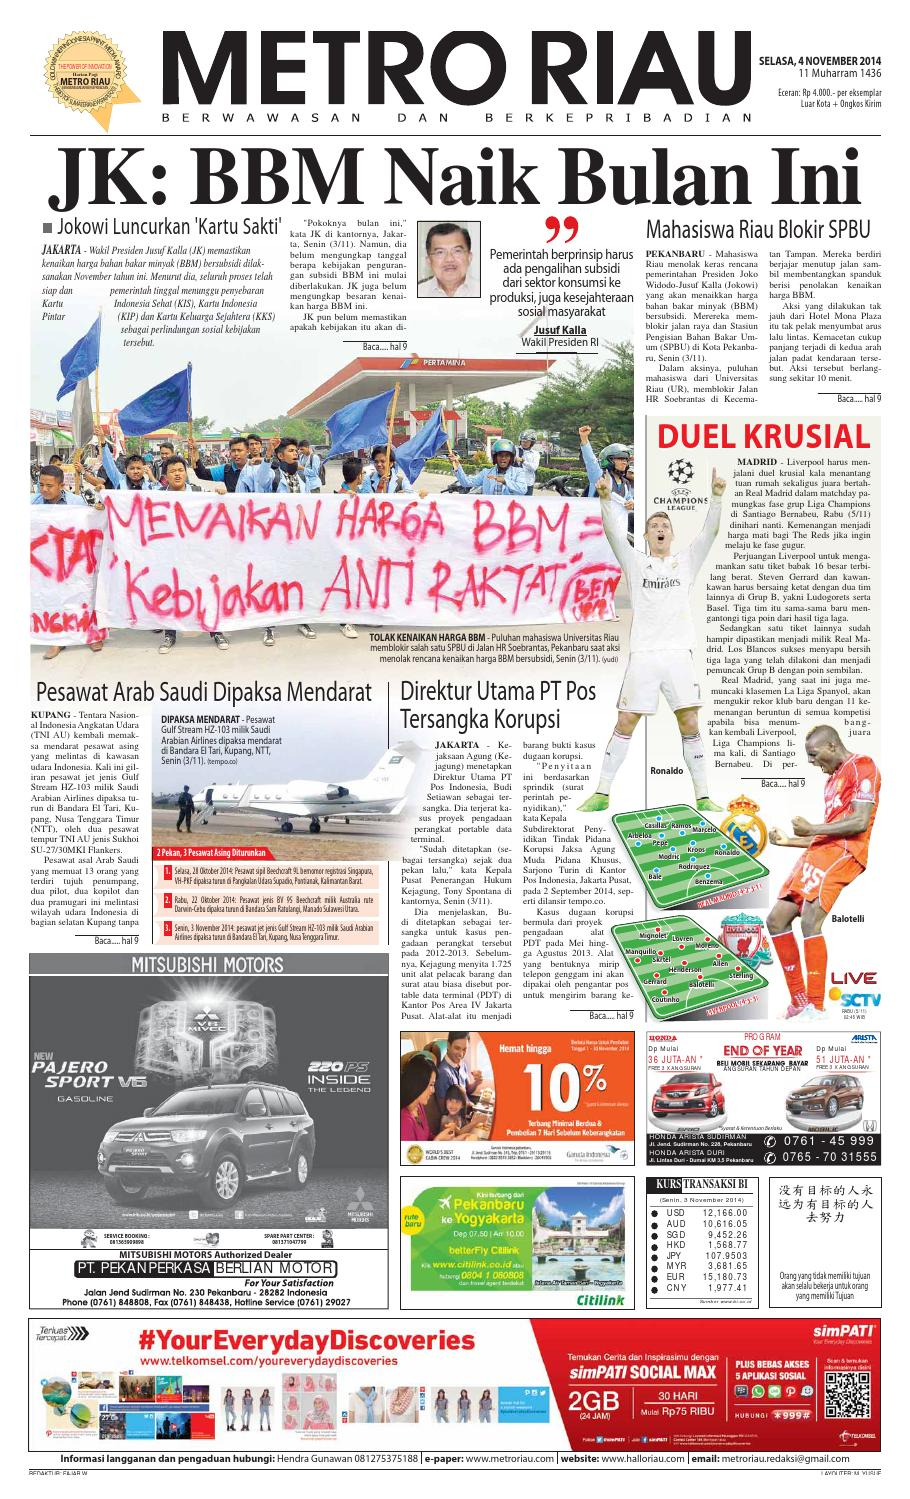 04112014 By Harian Pagi Metro Riau Issuu Samsung Galaxy J1 Mini Bundling Telkomsel Tau